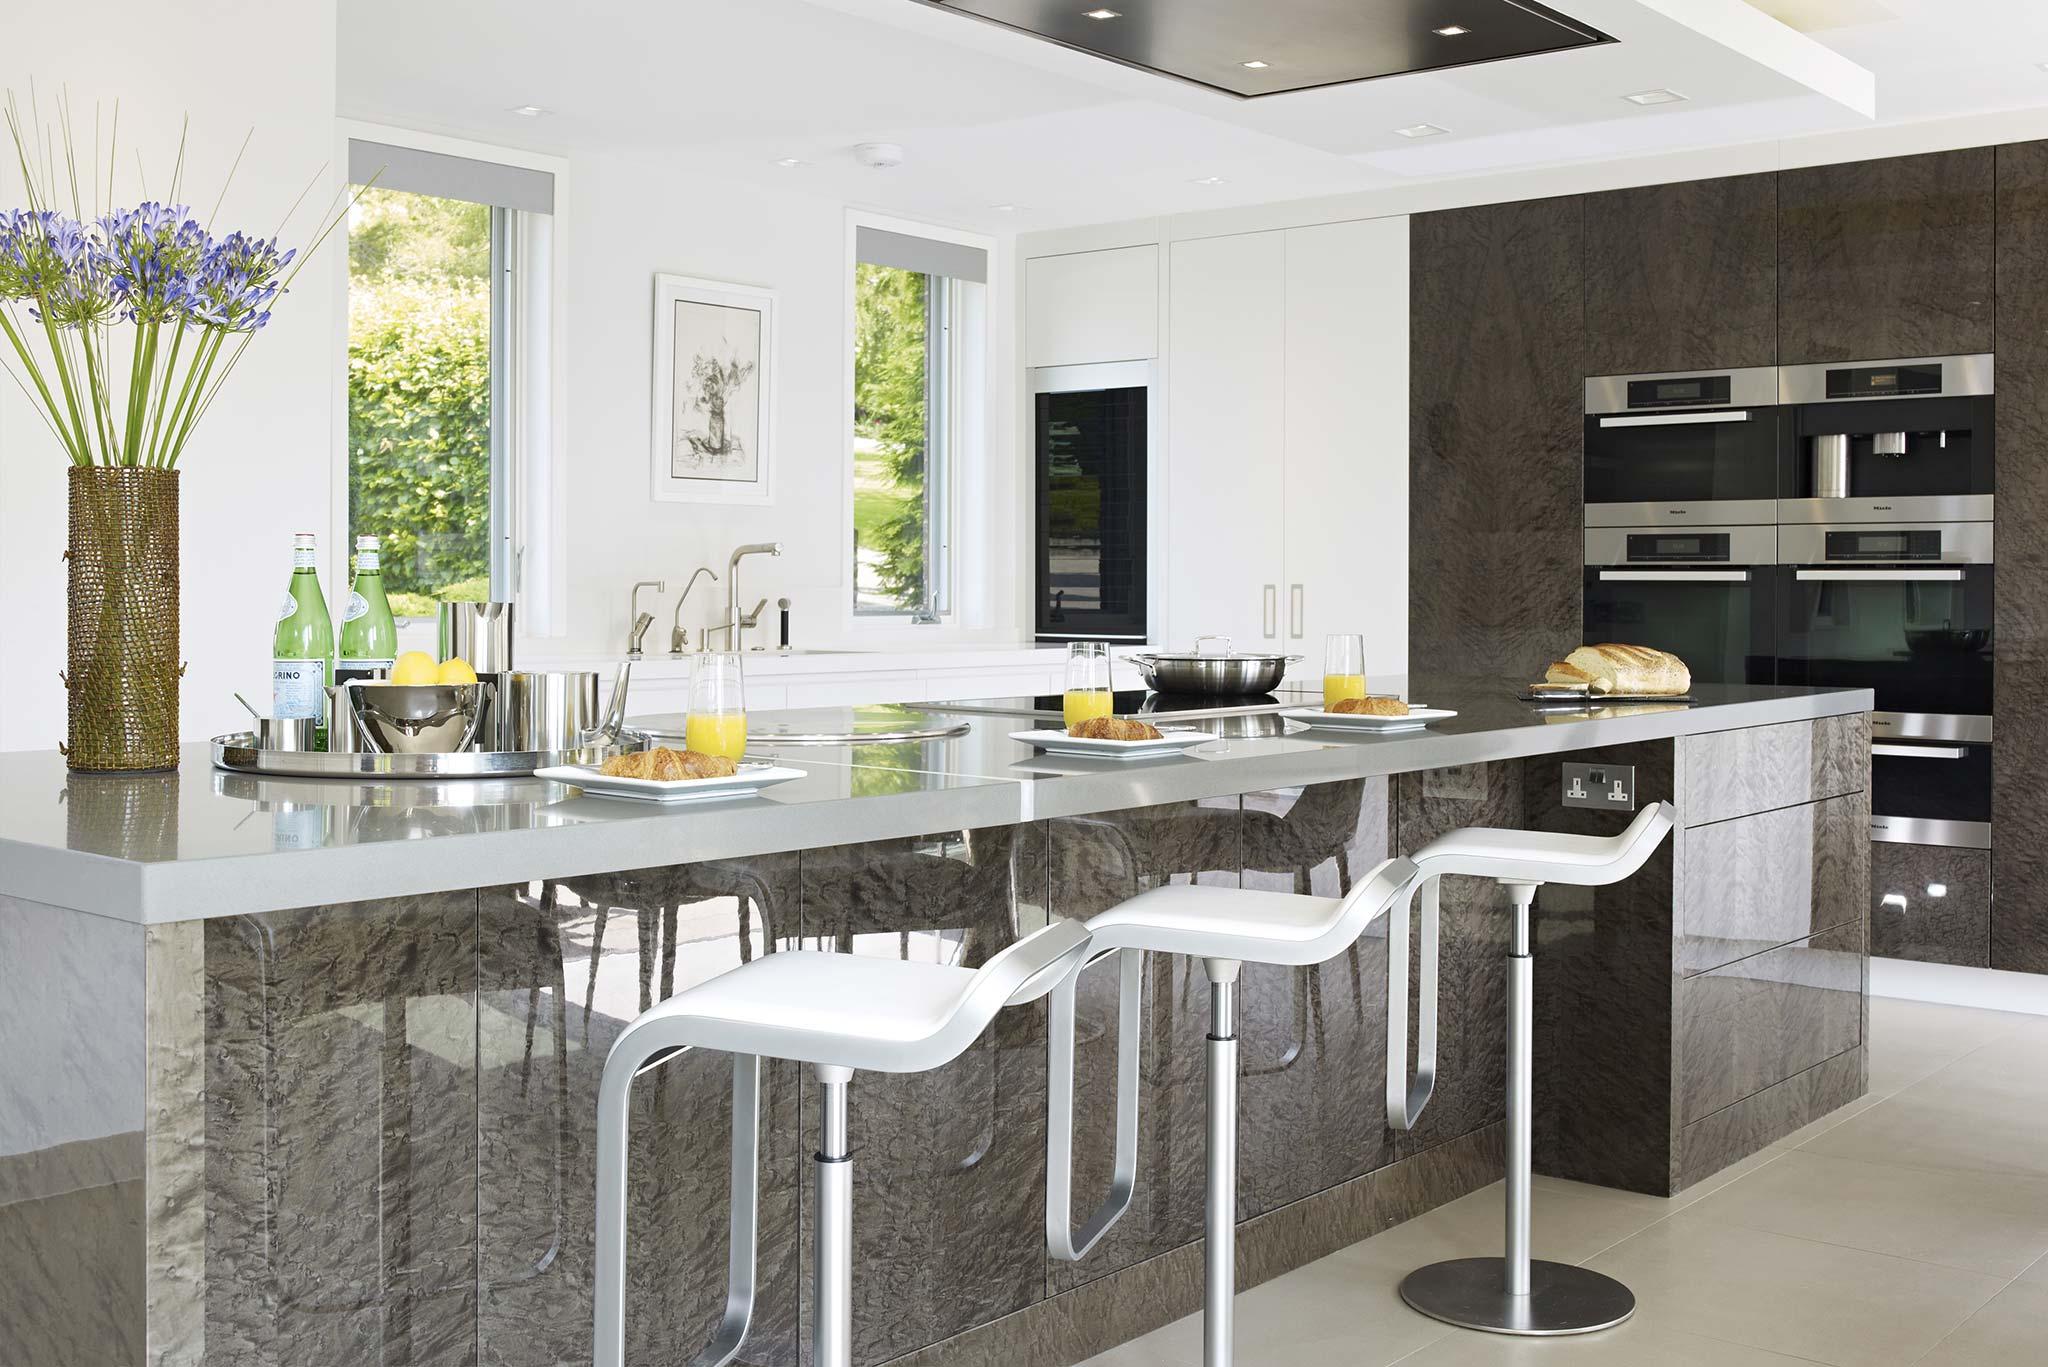 essex mansion interior designer essex callender howorth. Black Bedroom Furniture Sets. Home Design Ideas